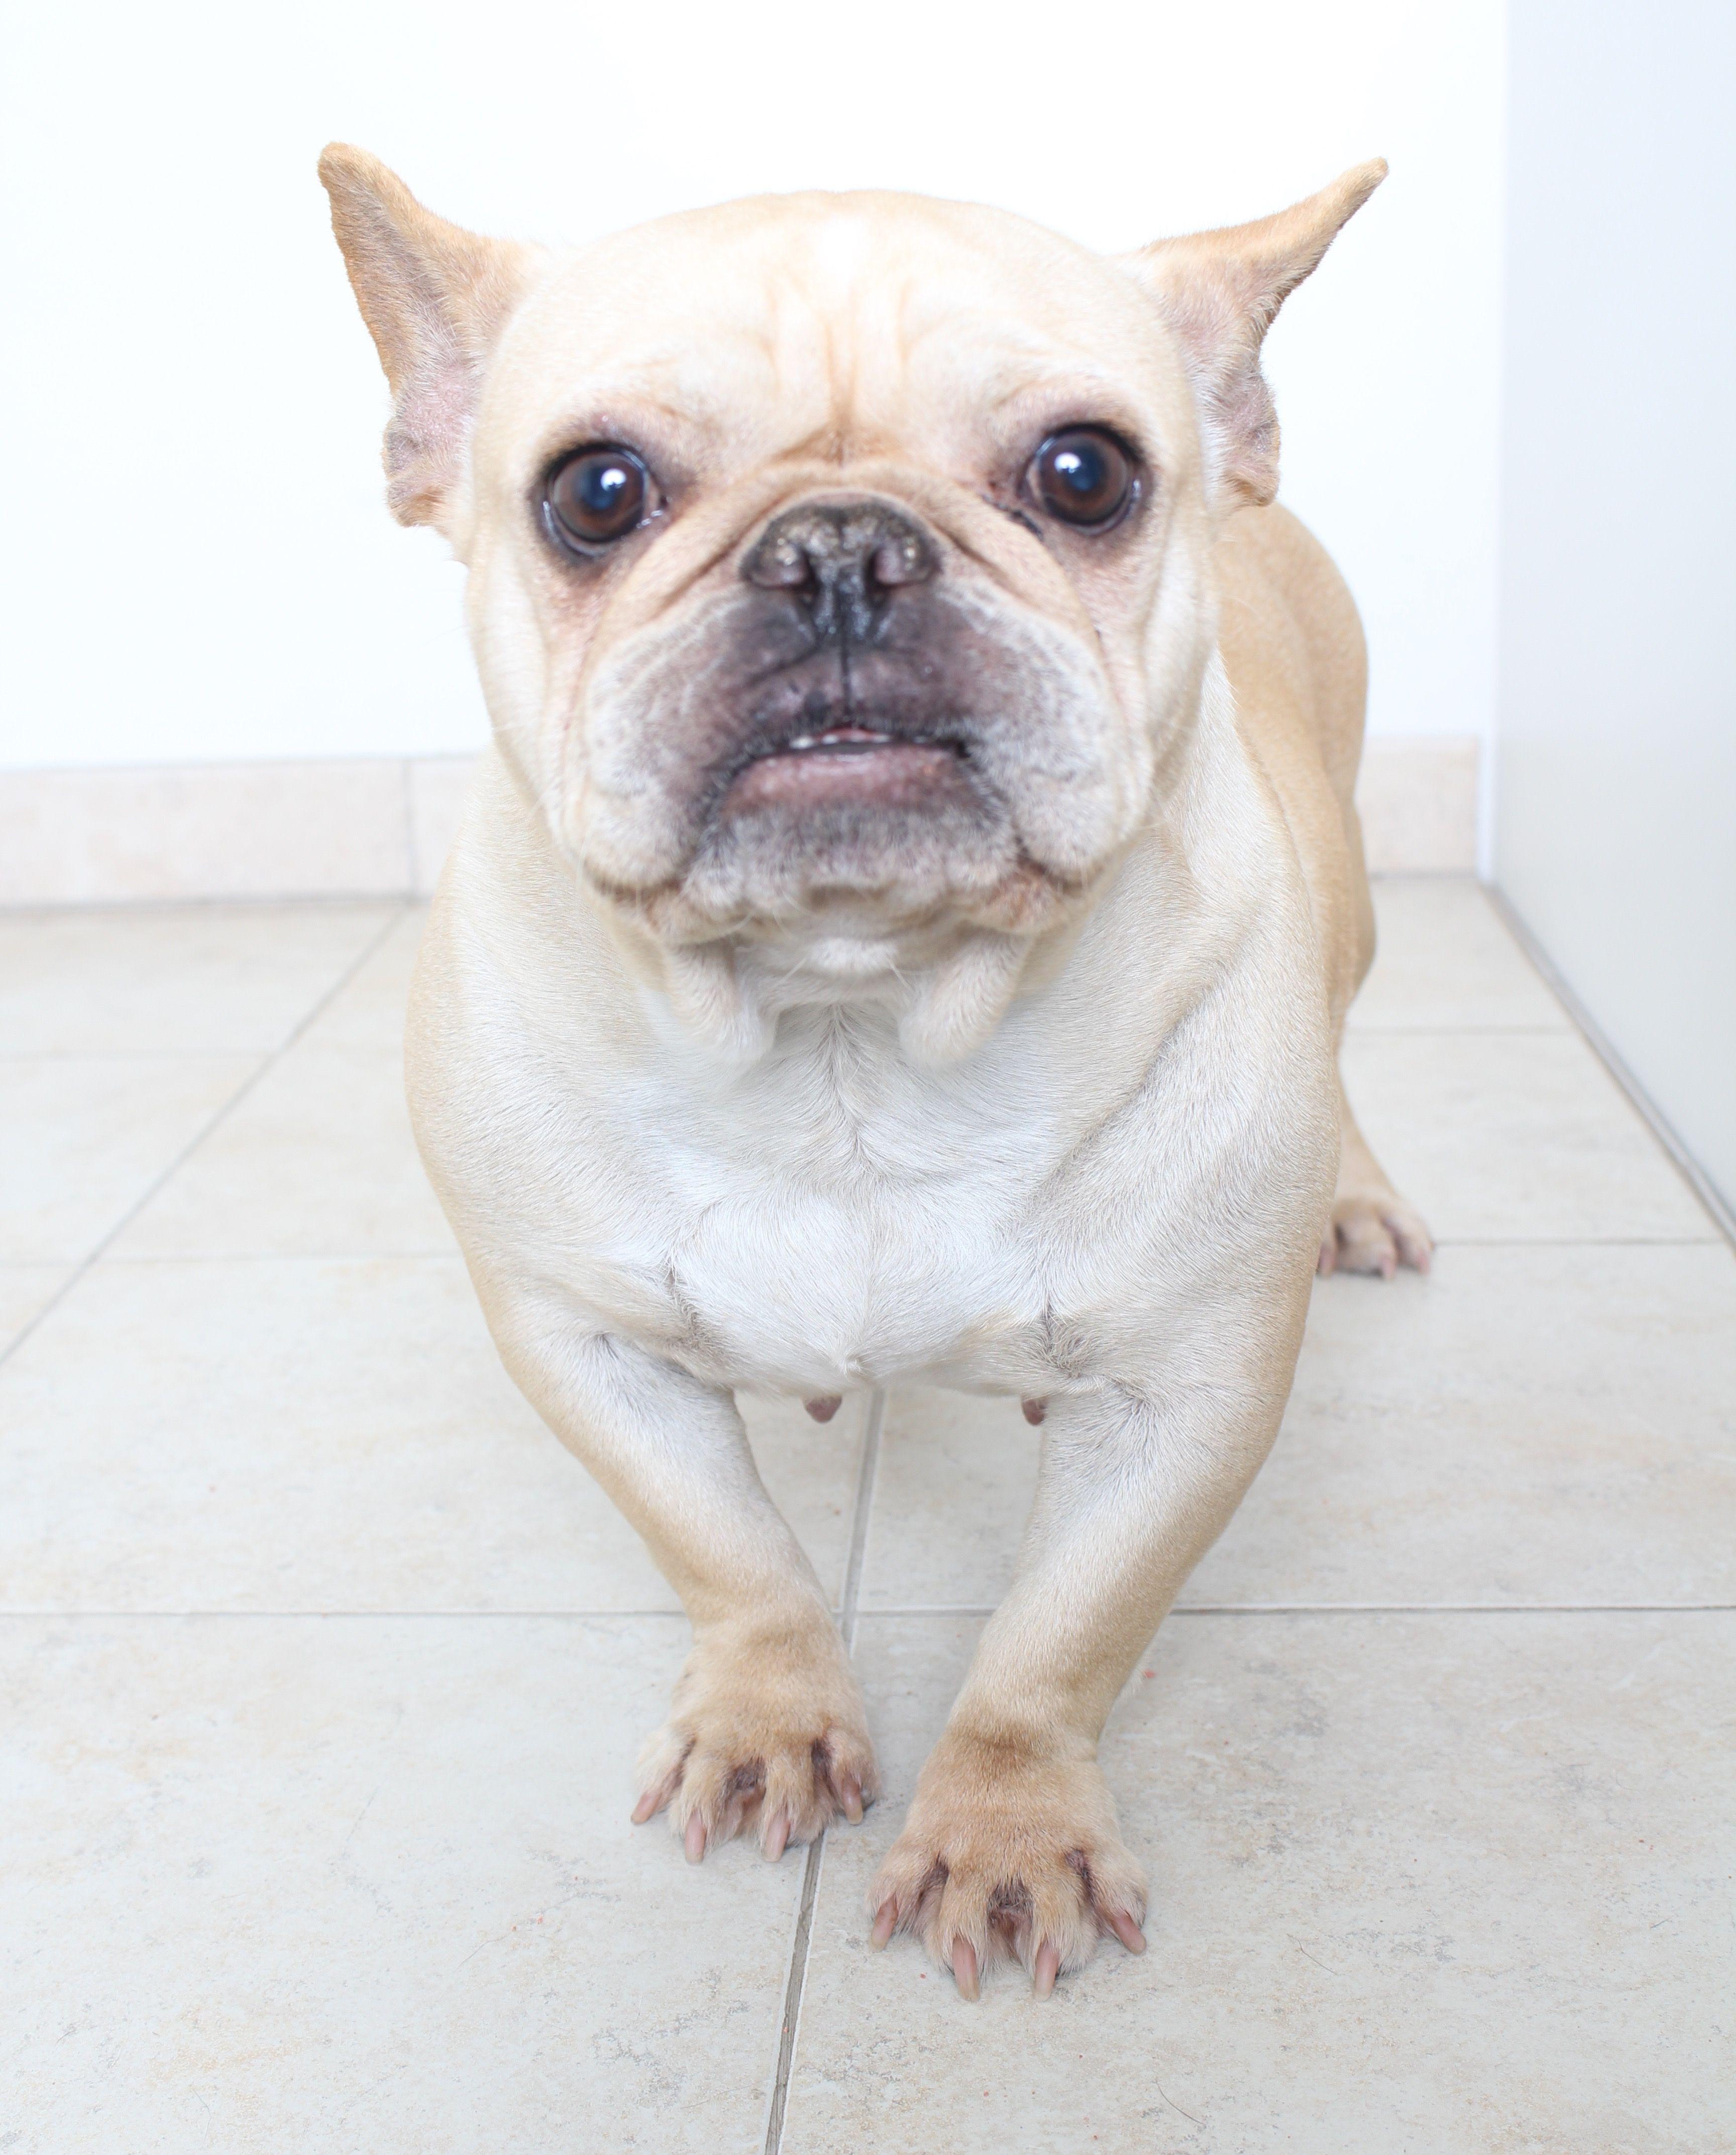 French Bulldog dog for Adoption in Eden Prairie, MN. ADN